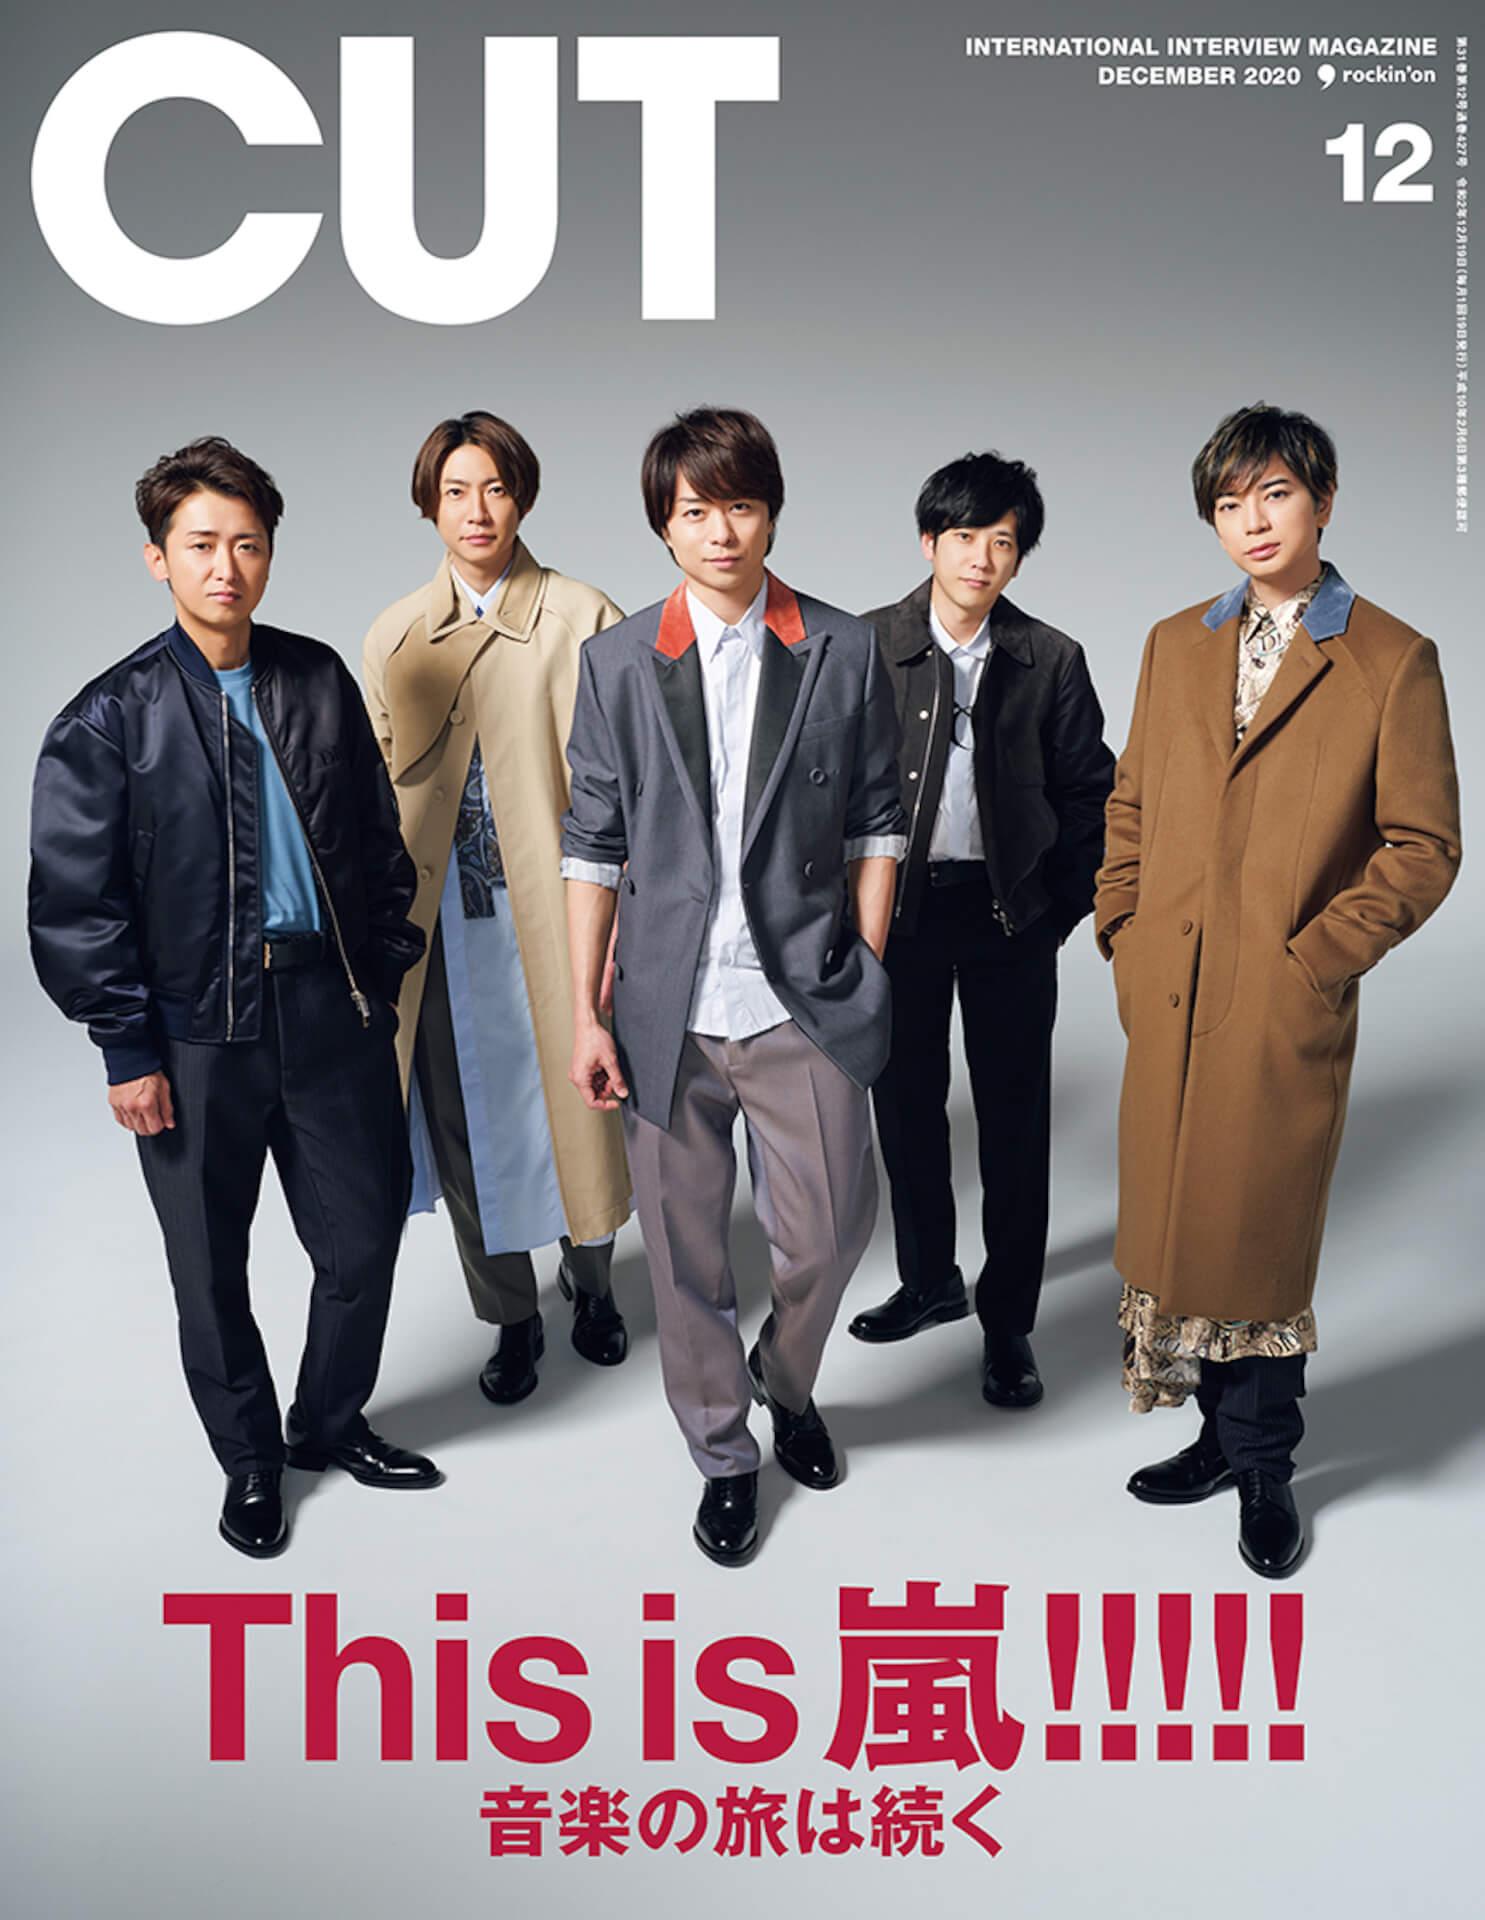 『CUT』12月号の表紙巻頭特集は嵐!「終わらない音楽の旅」に迫ったメンバー全員へのインタビューも掲載 culture20201116_cut_arashi_1